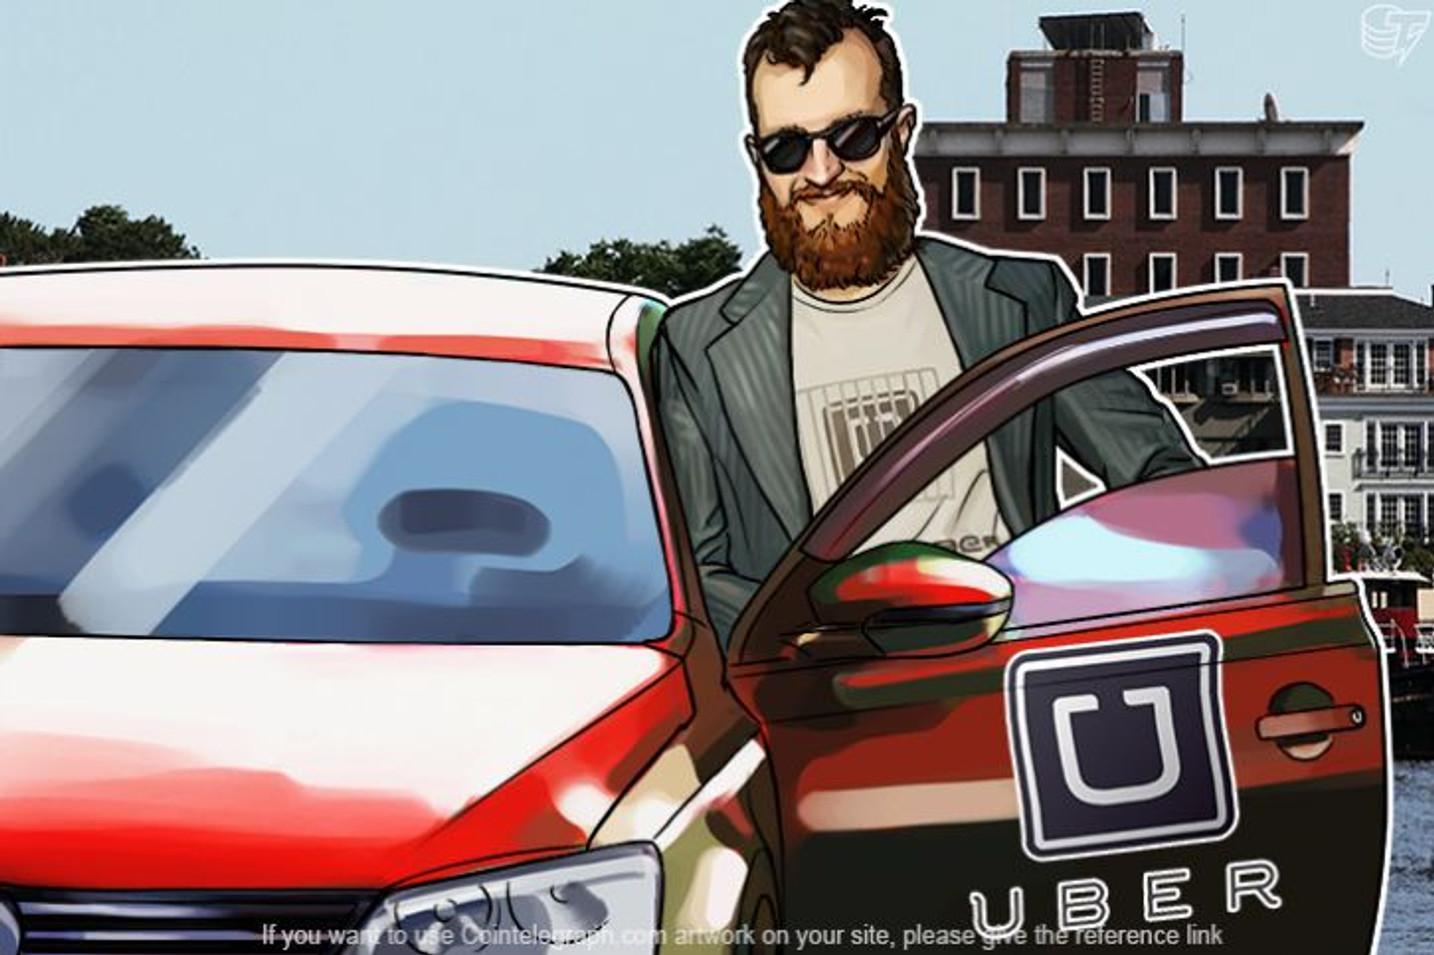 Swarm Aktivizam uz Bitkoin: Oslobodi Uber